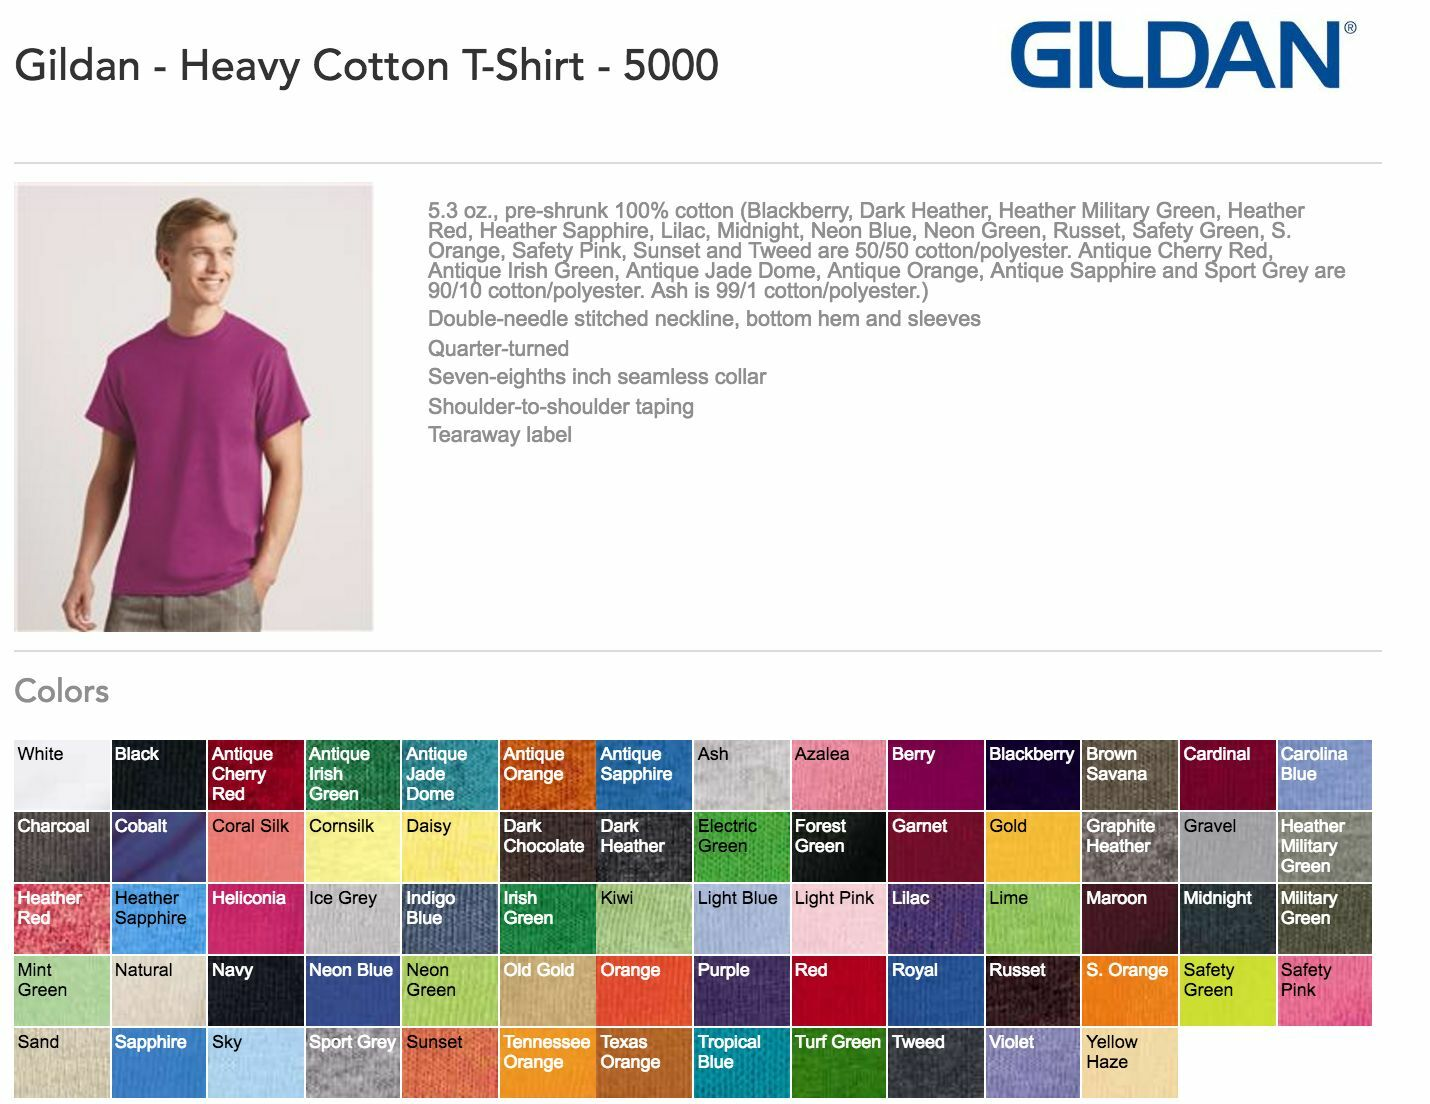 100 Gildan T-SHIRTS BLANK BULK LOT in colors or 112 White S M L XL Wholesale .